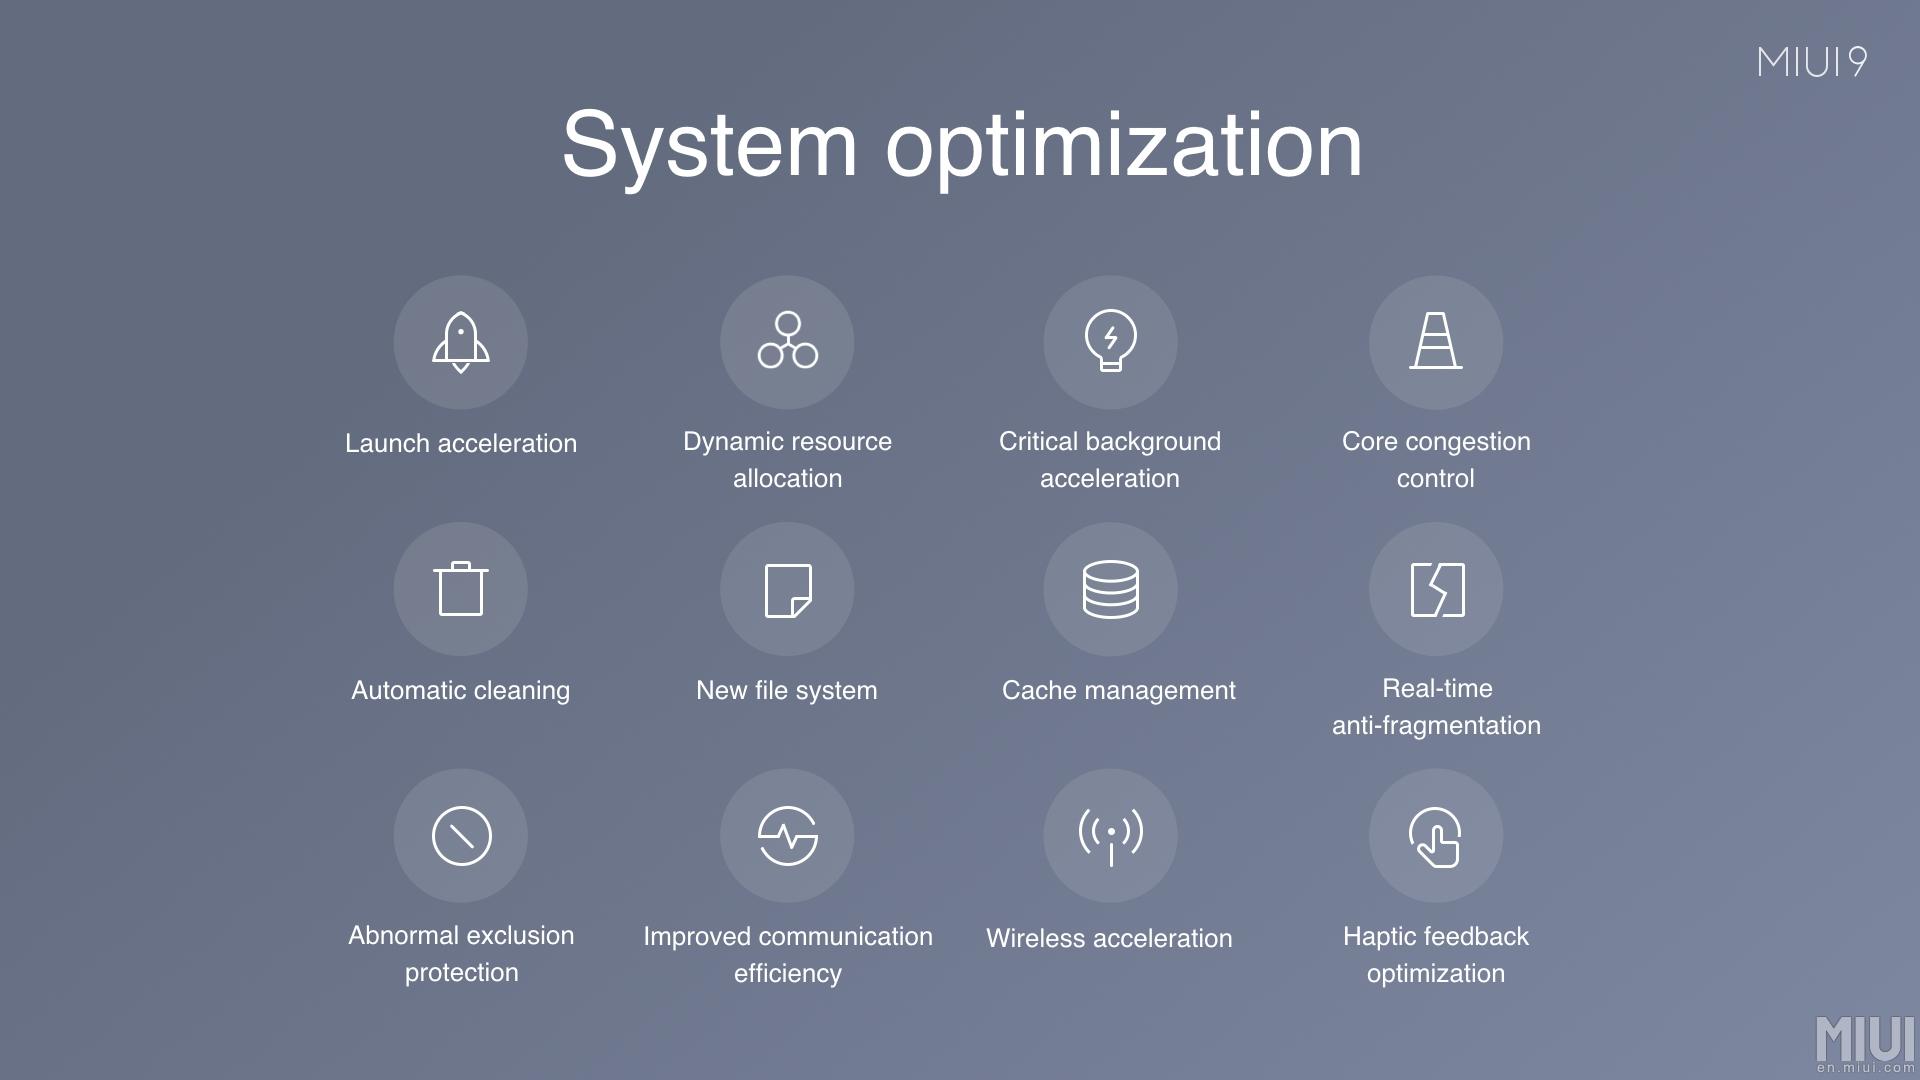 miui 9 optimizaciones